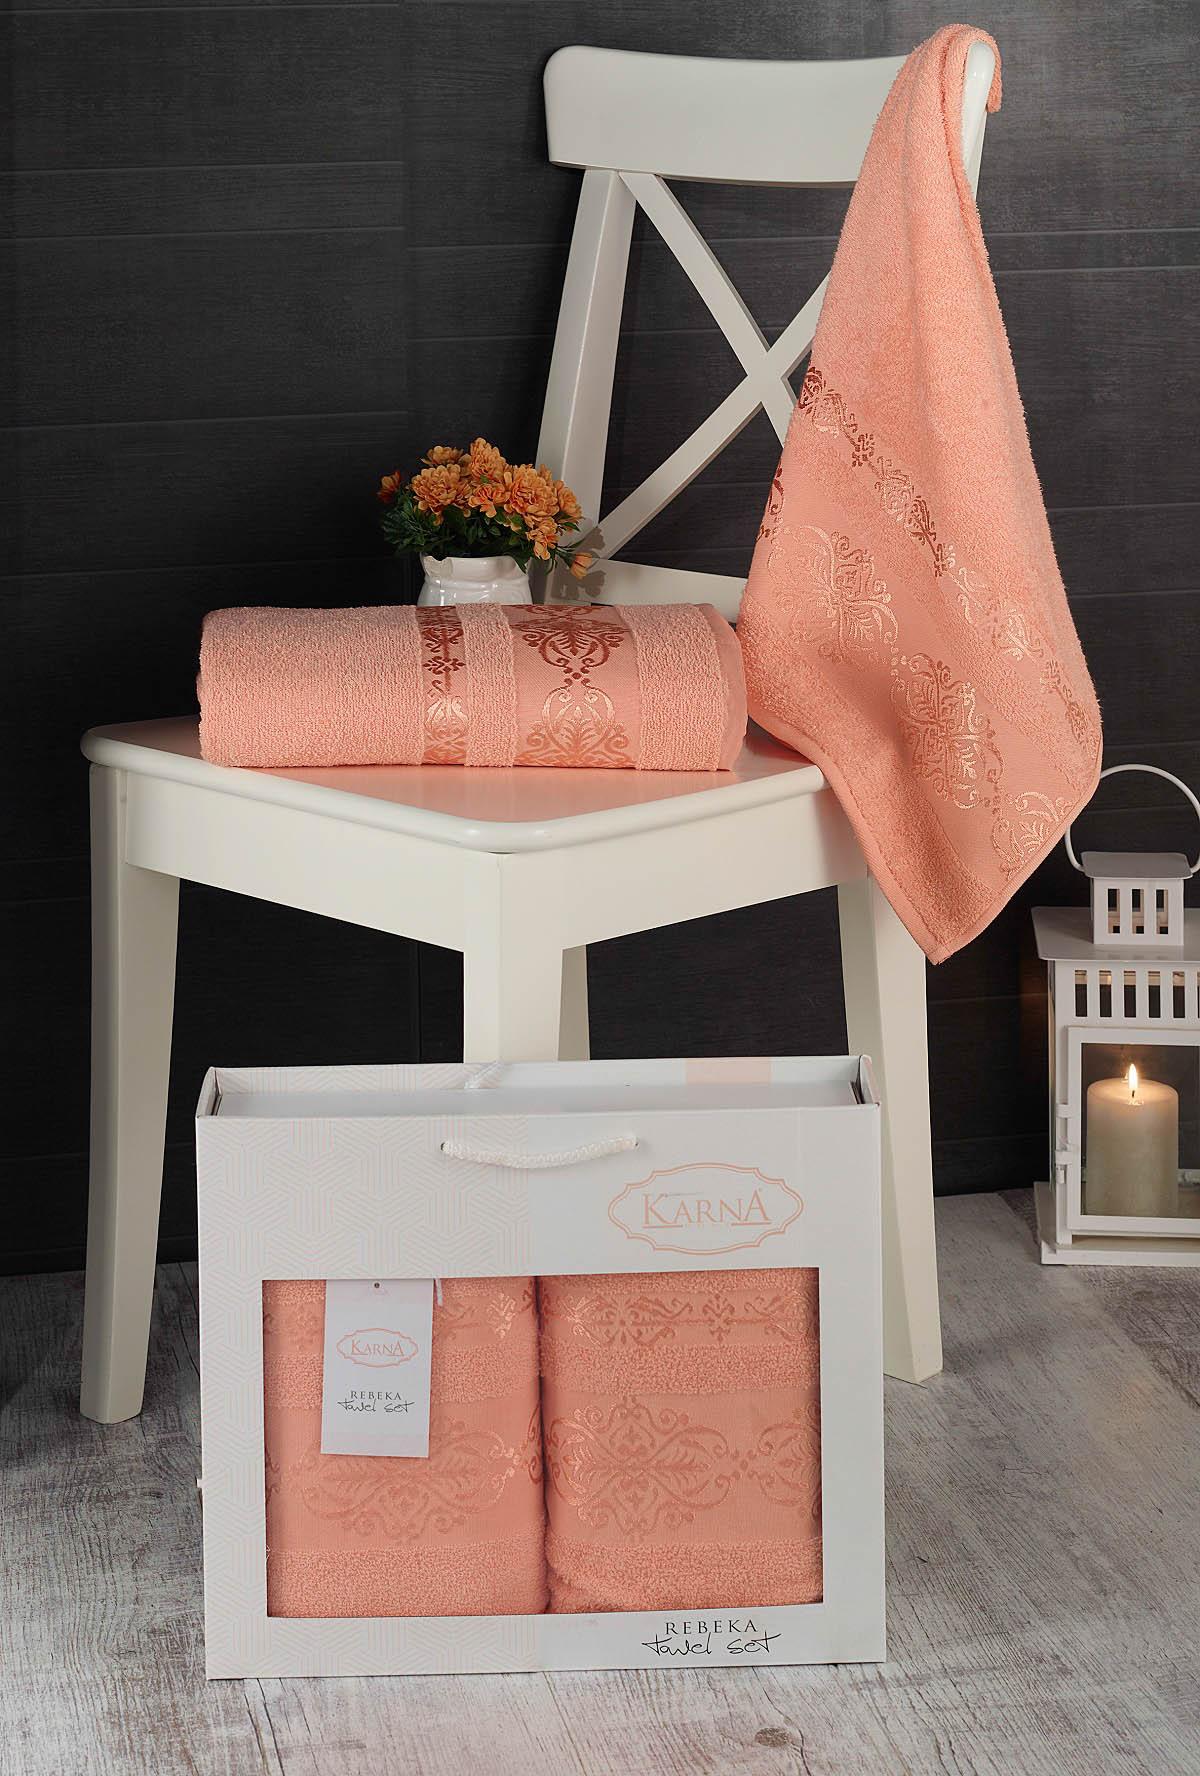 Полотенца Karna Полотенце Rebeca Цвет: Абрикосовый (50х90 см,70х140 см) цены онлайн